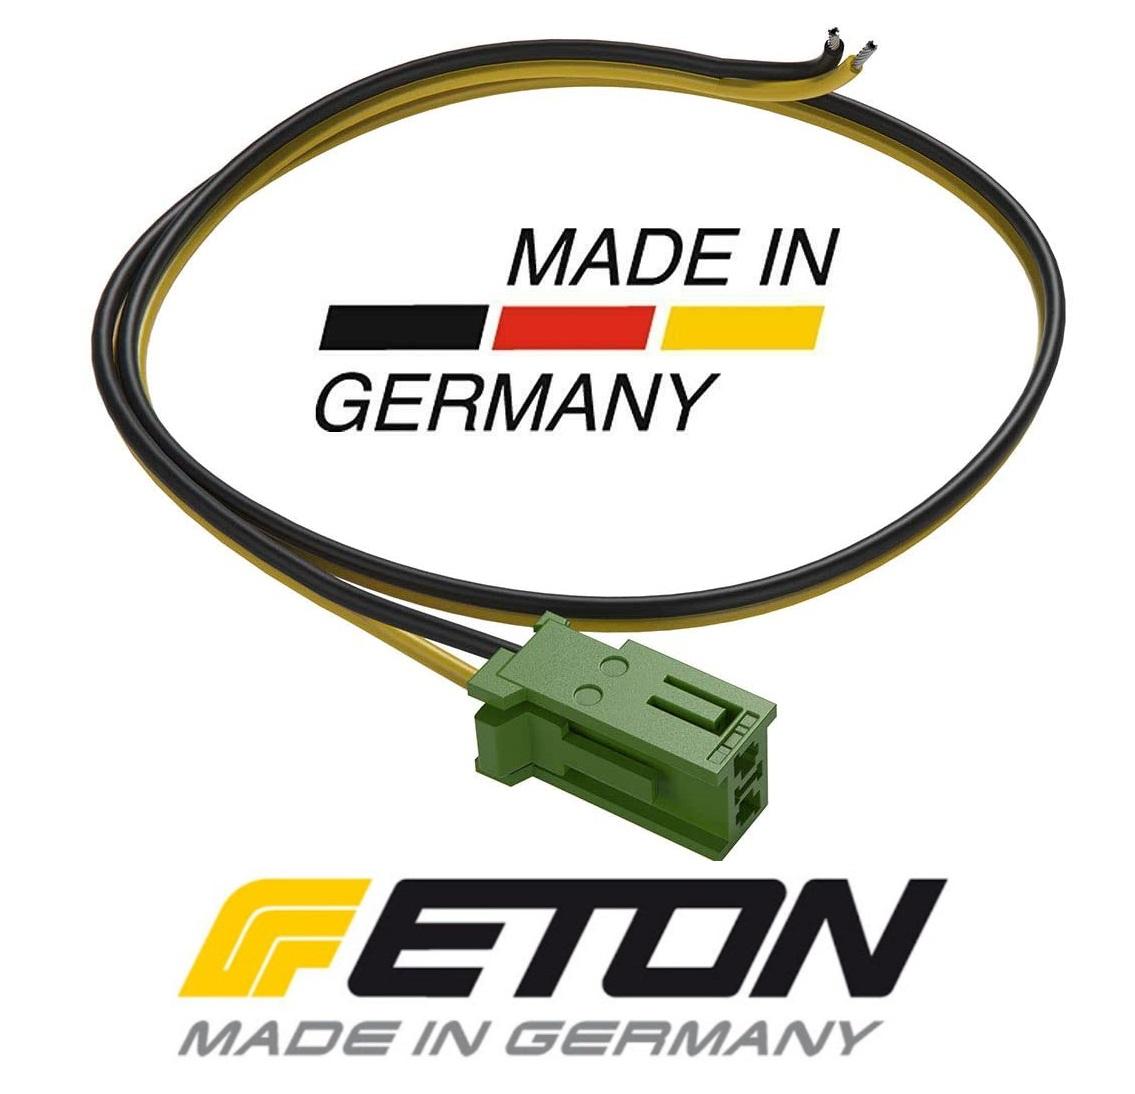 ETON MBSCC SCC Wooferanschlusskabel Mercedes Benz System Anschlusskabel-Kit